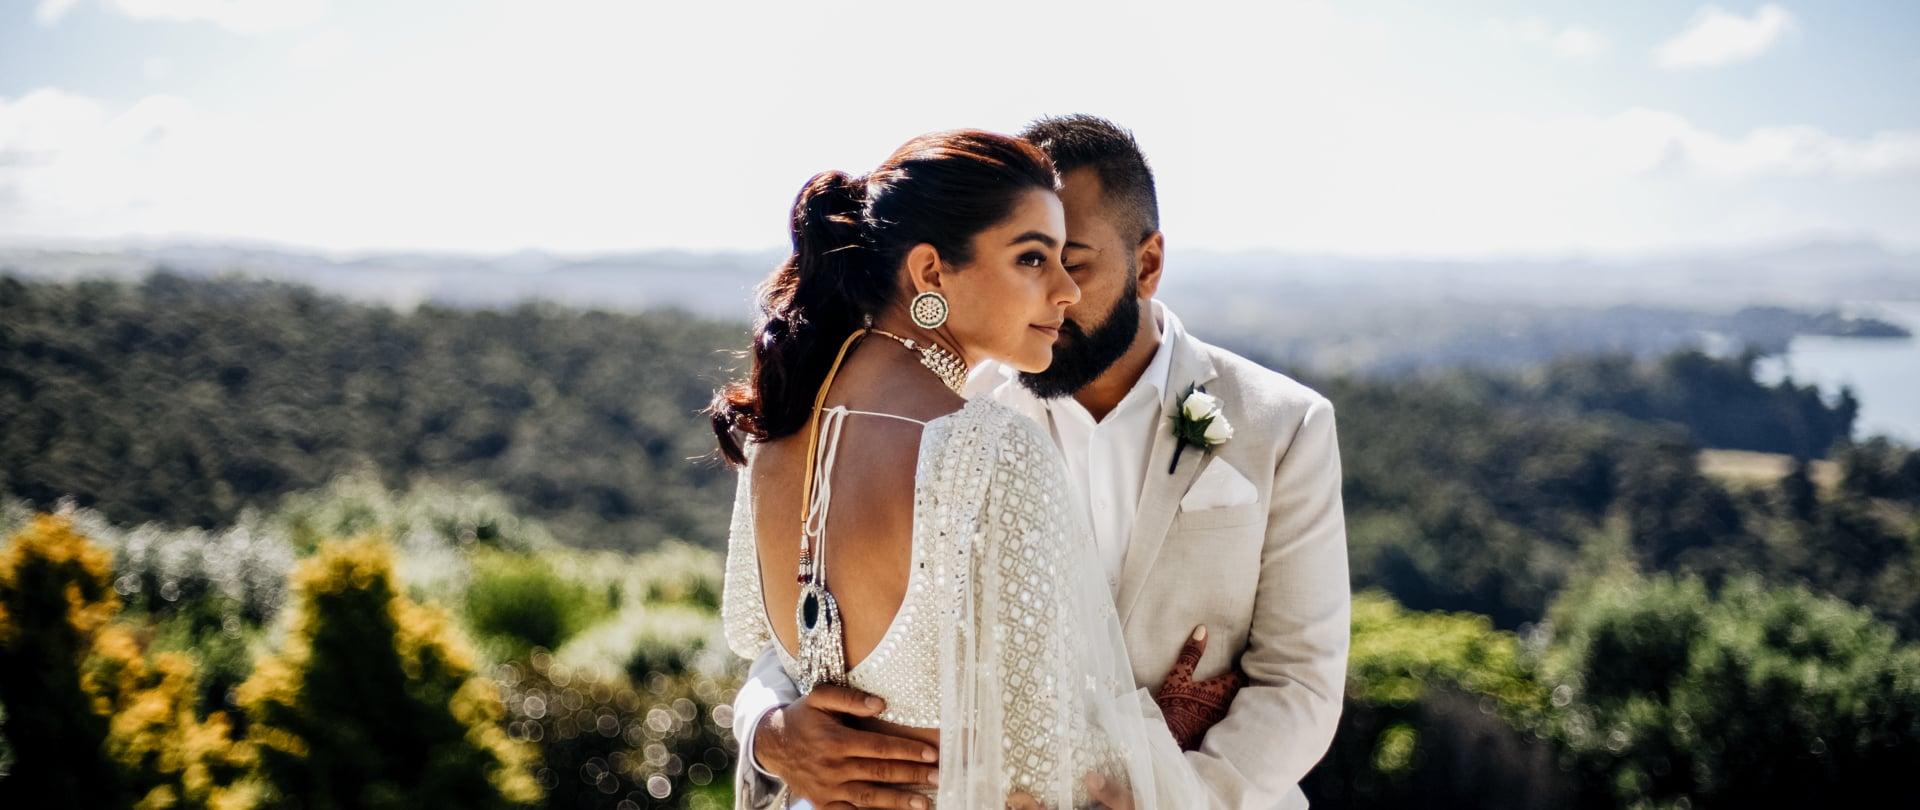 Nandika & Vishal Wedding Video Filmed at Auckland, New Zealand